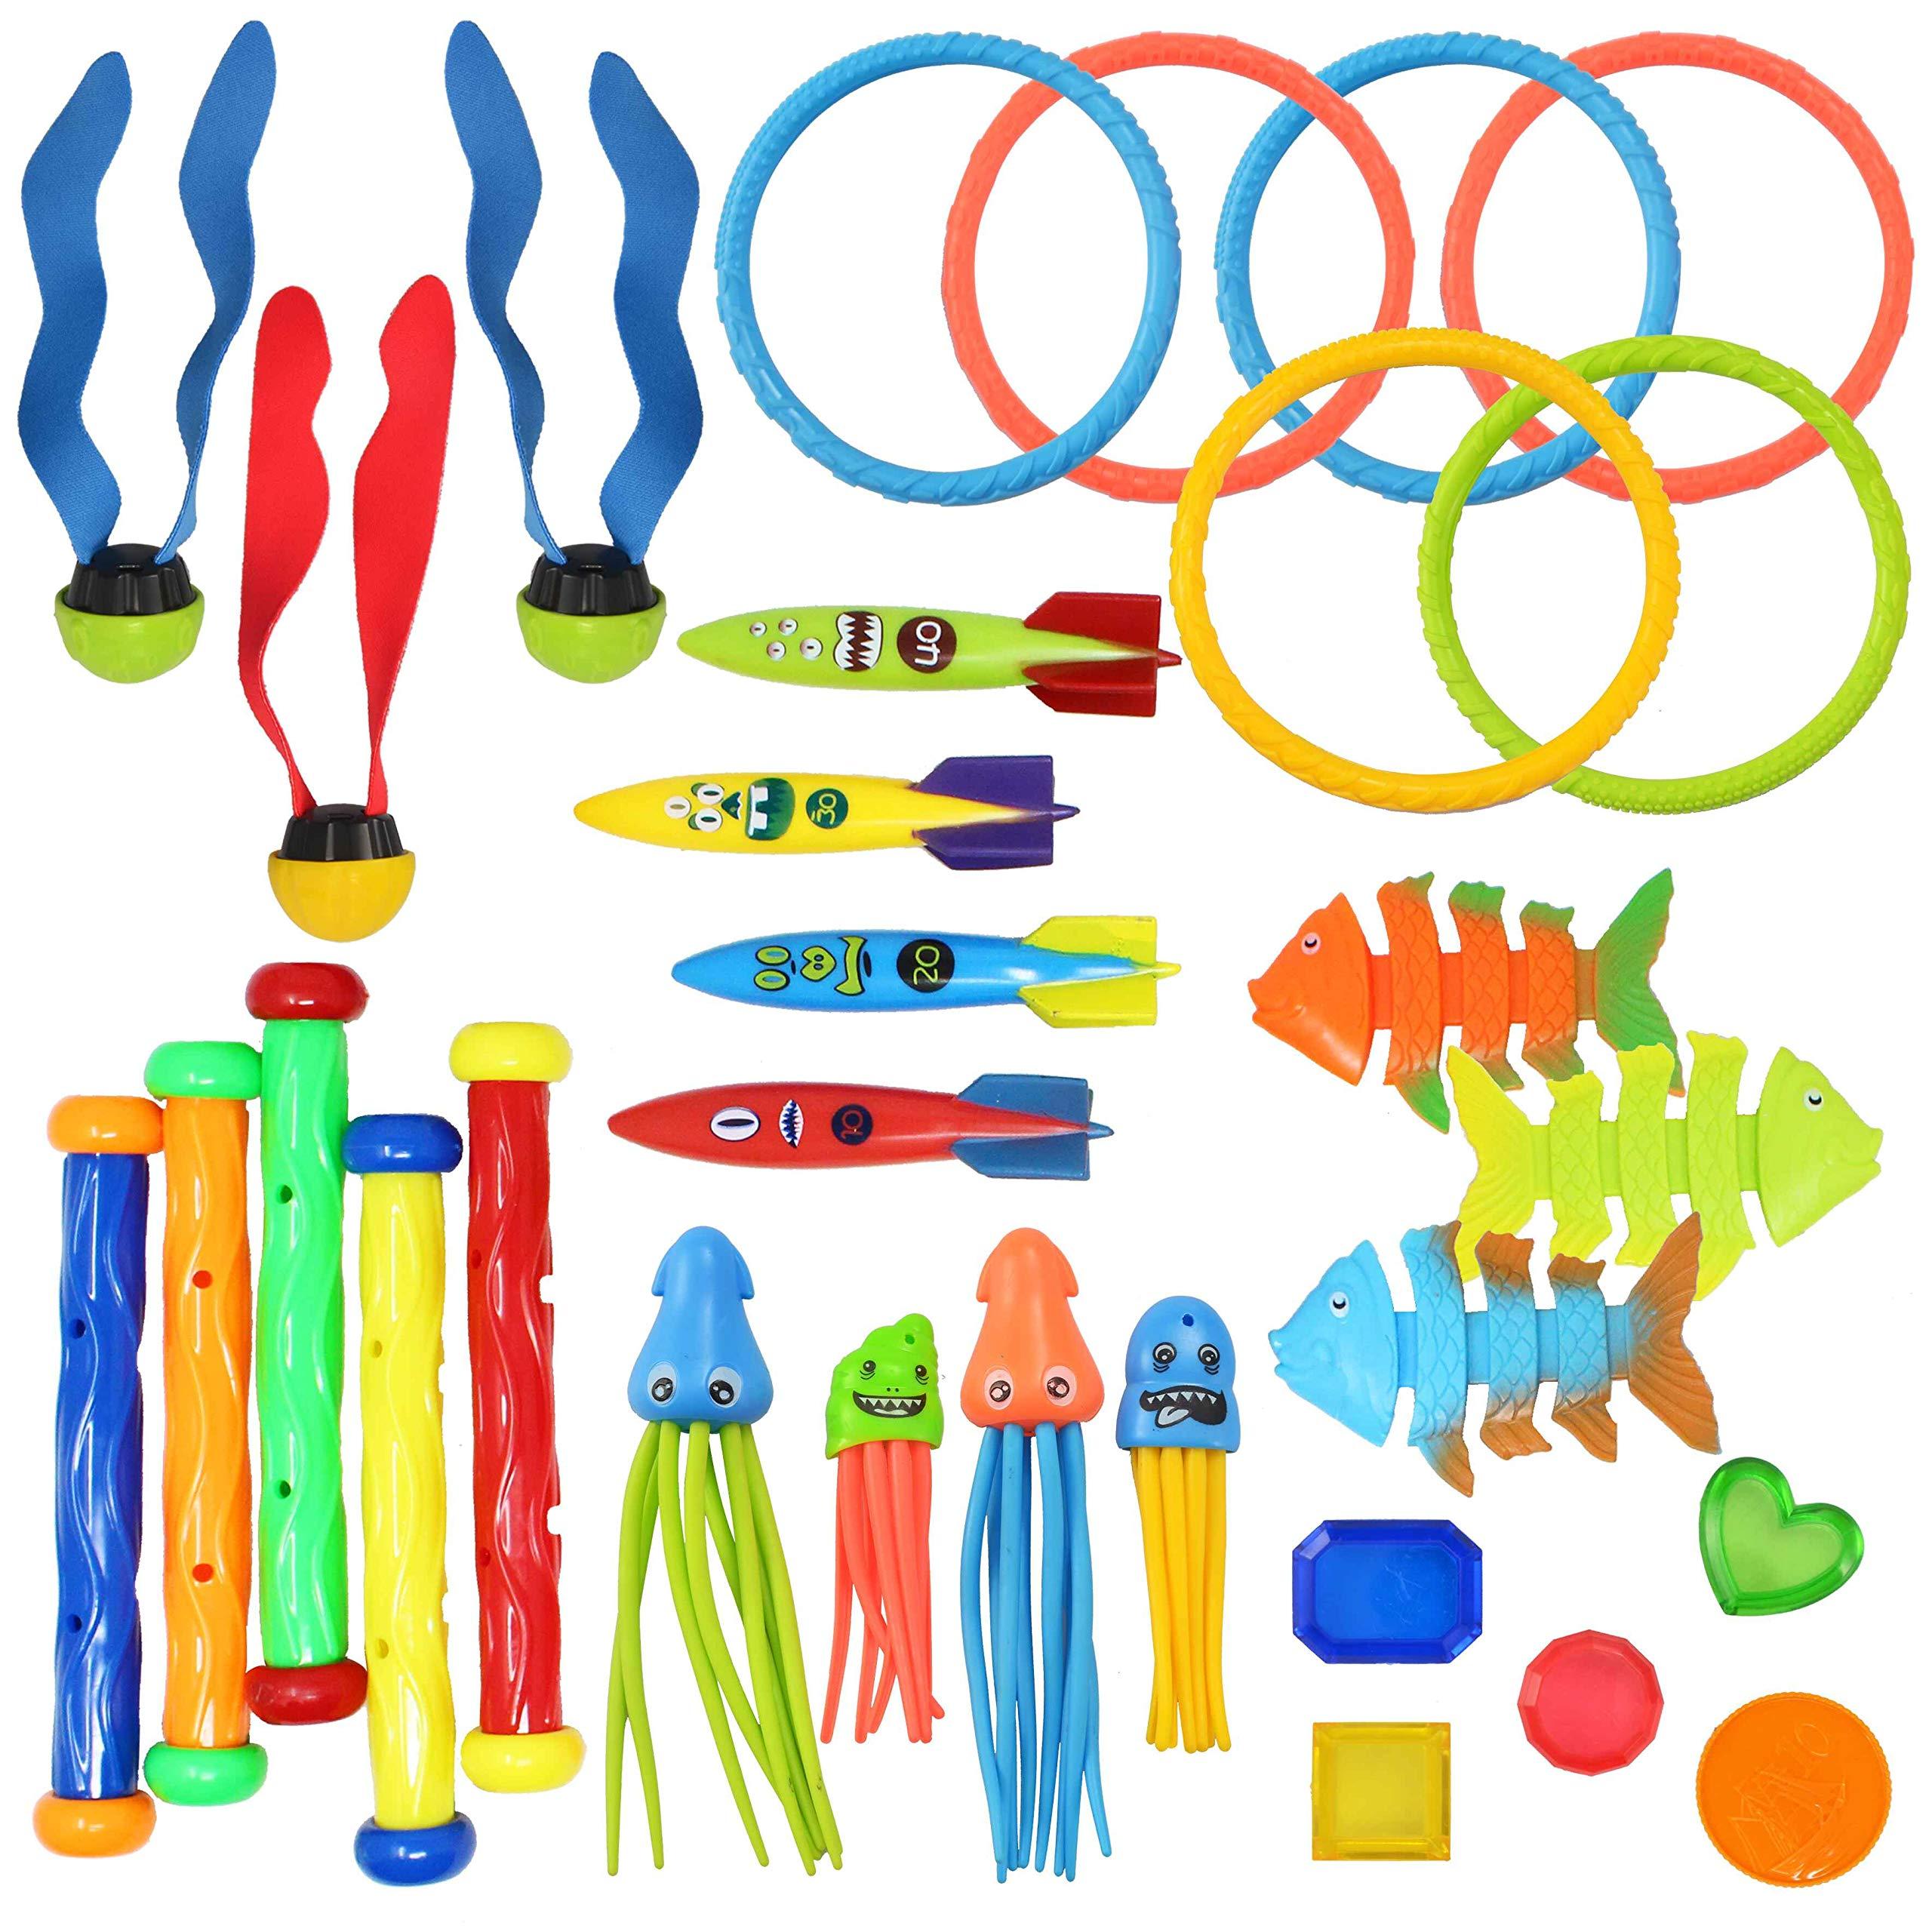 JOYIN 30 Pcs Diving Pool Toys Jumbo Set Includes (5) Diving Sticks, (6) Diving Rings, (5) Pirate Treasures, (4) Toypedo Bandits, (3) Diving Toy Balls, (3) Fish Toys, (4) Stringy Octopus by JOYIN (Image #1)